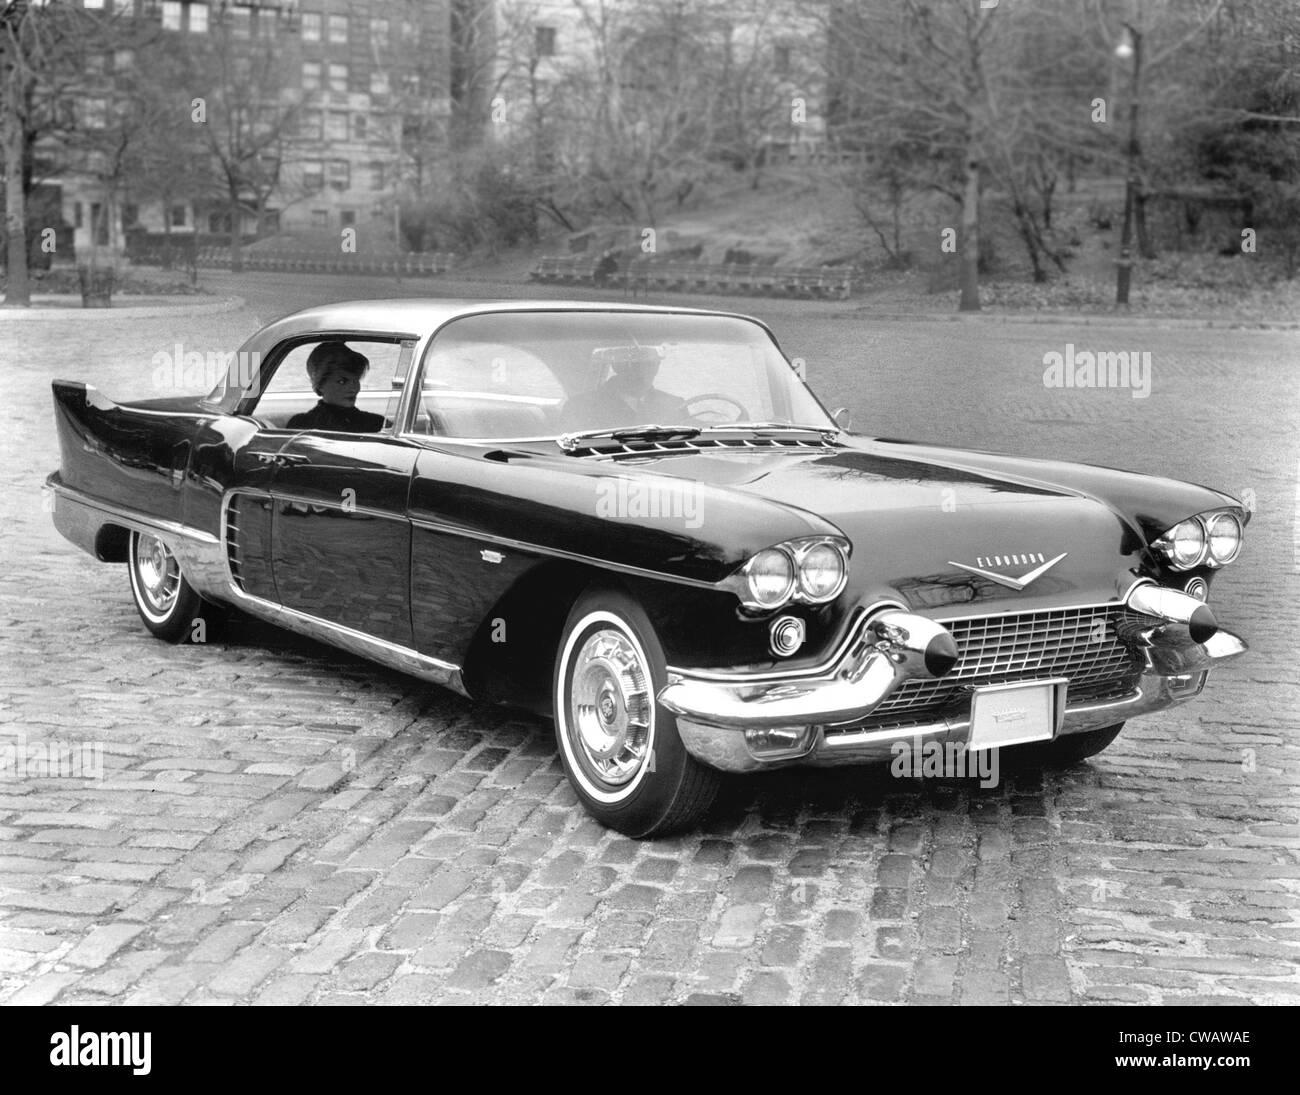 Cadillac Eldorado Broughman, 1950. Avec la permission de la CSU: Archives / Everett Collection Photo Stock